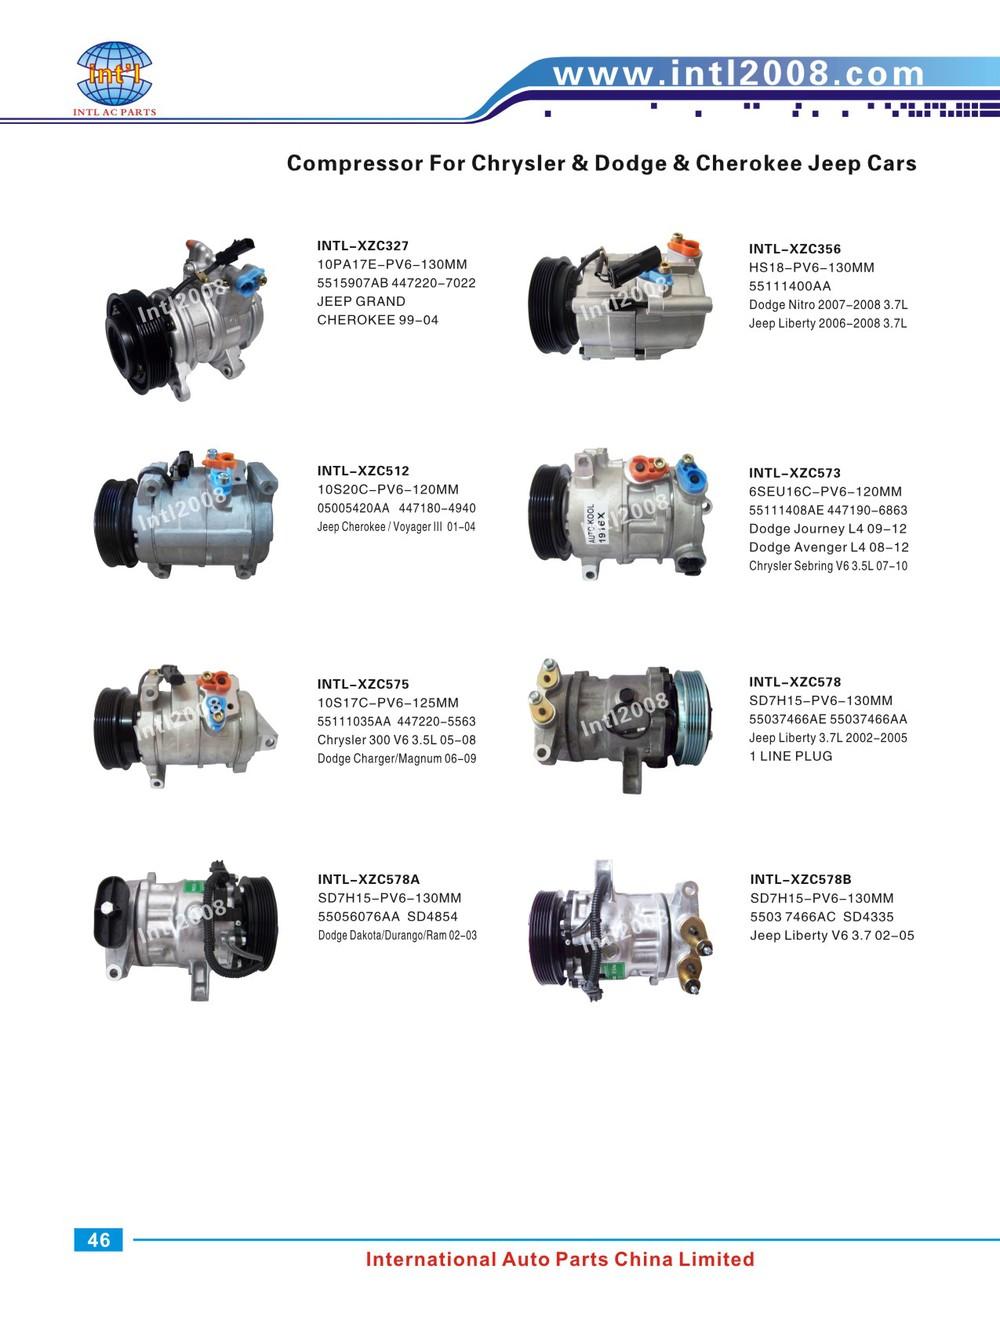 07 Dodge Caliber 2 0 Belt Diagram Schematics Data Wiring Diagrams 2008 Engine 08 Ac Auto Parts Catalog And 2007